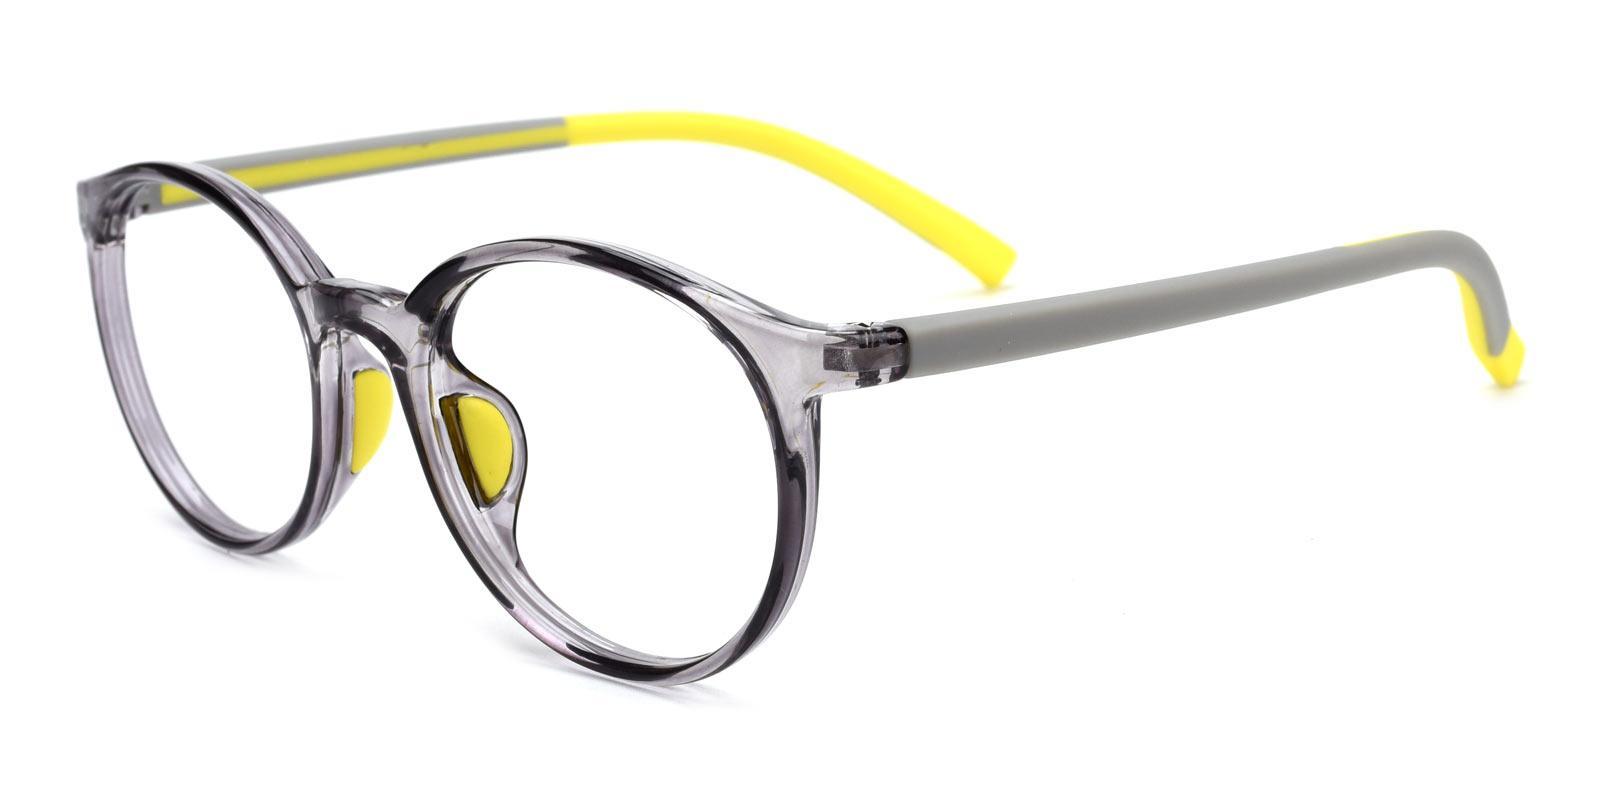 Alex-Gray-Oval-Plastic-Eyeglasses-detail